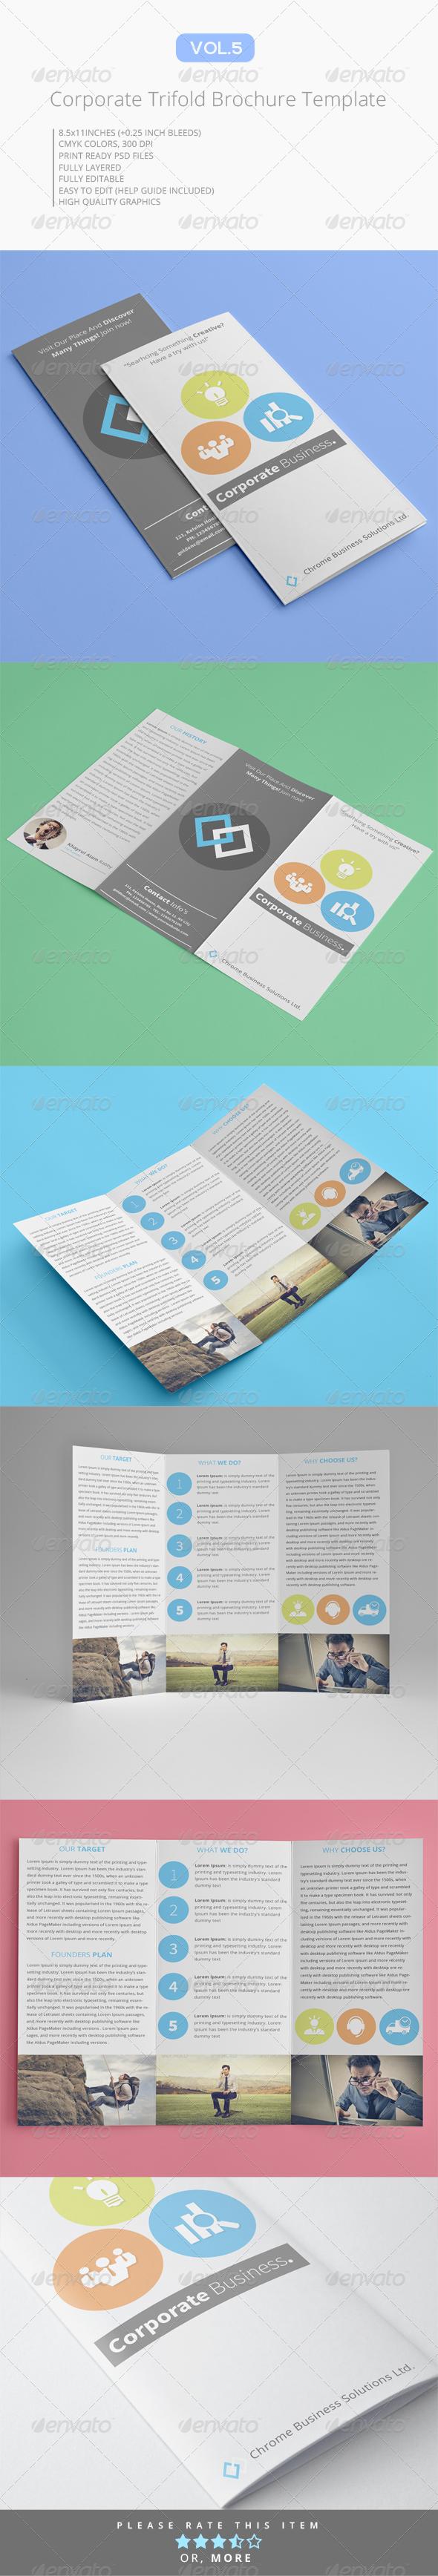 GraphicRiver Corproate Trifold Brochure V.5 7127667